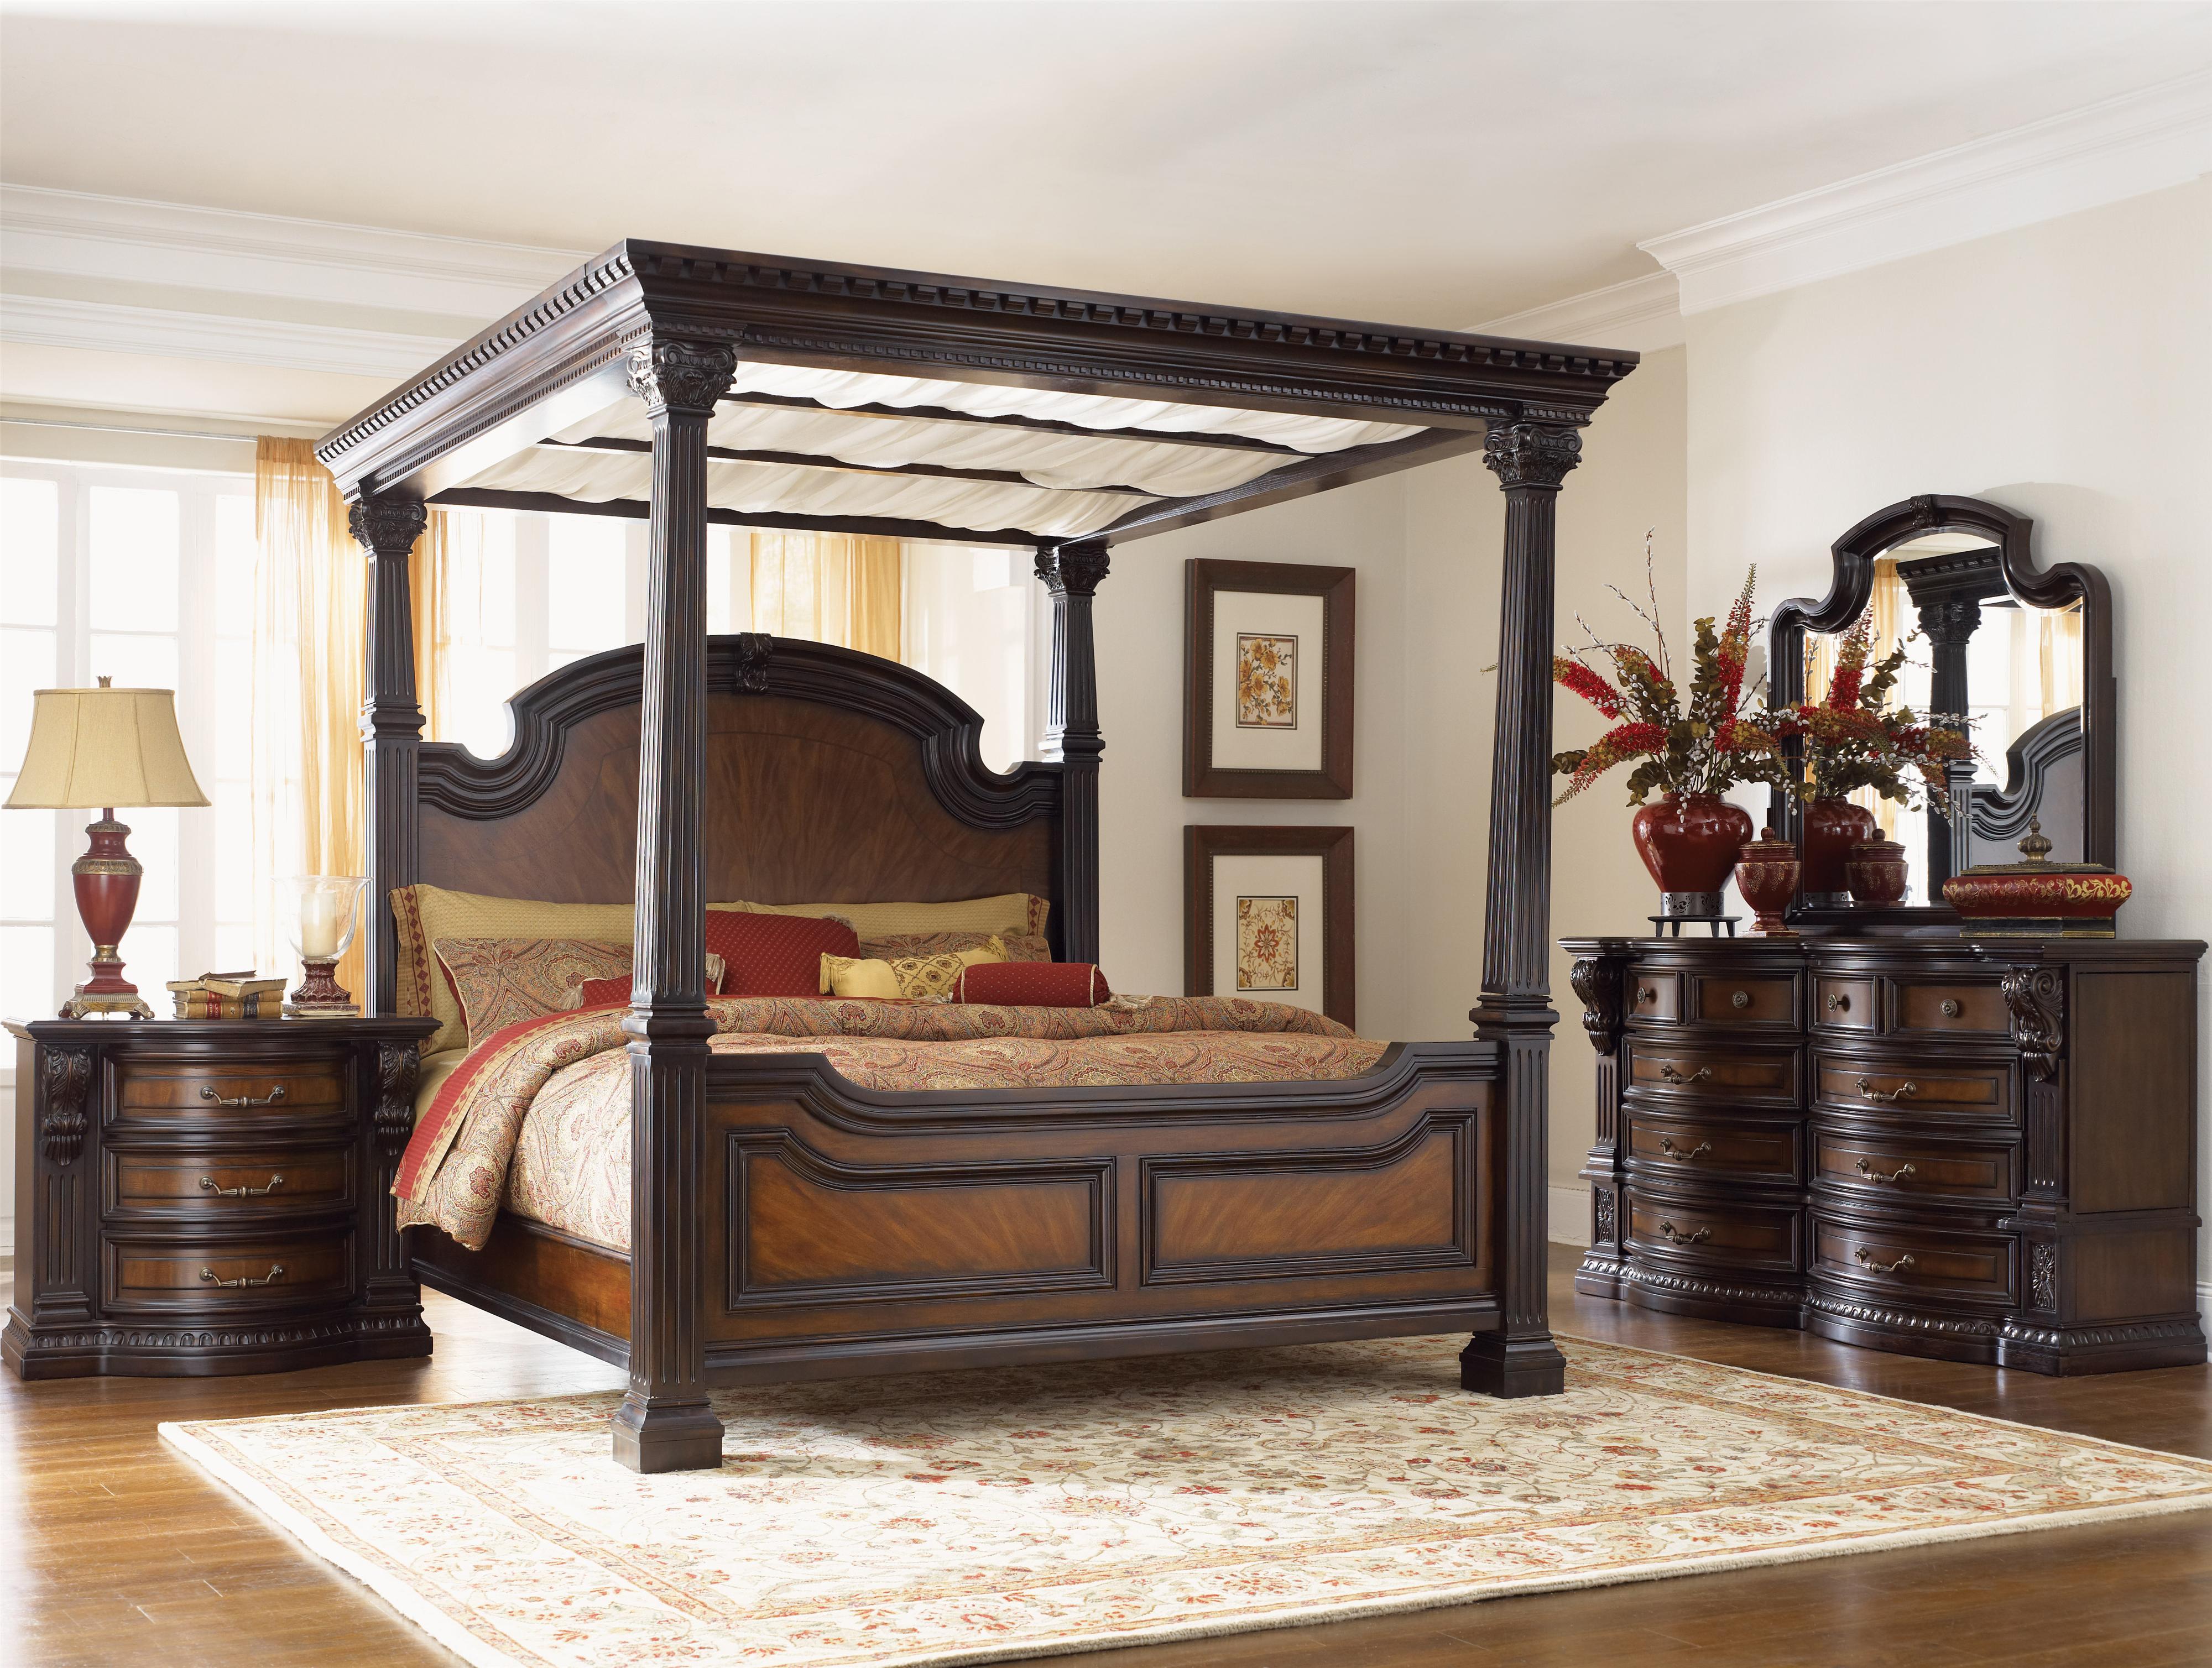 Grand estates 02 by fairmont designs royal furniture fairmont designs grand estates dealer for Fairmont designs bedroom furniture sets